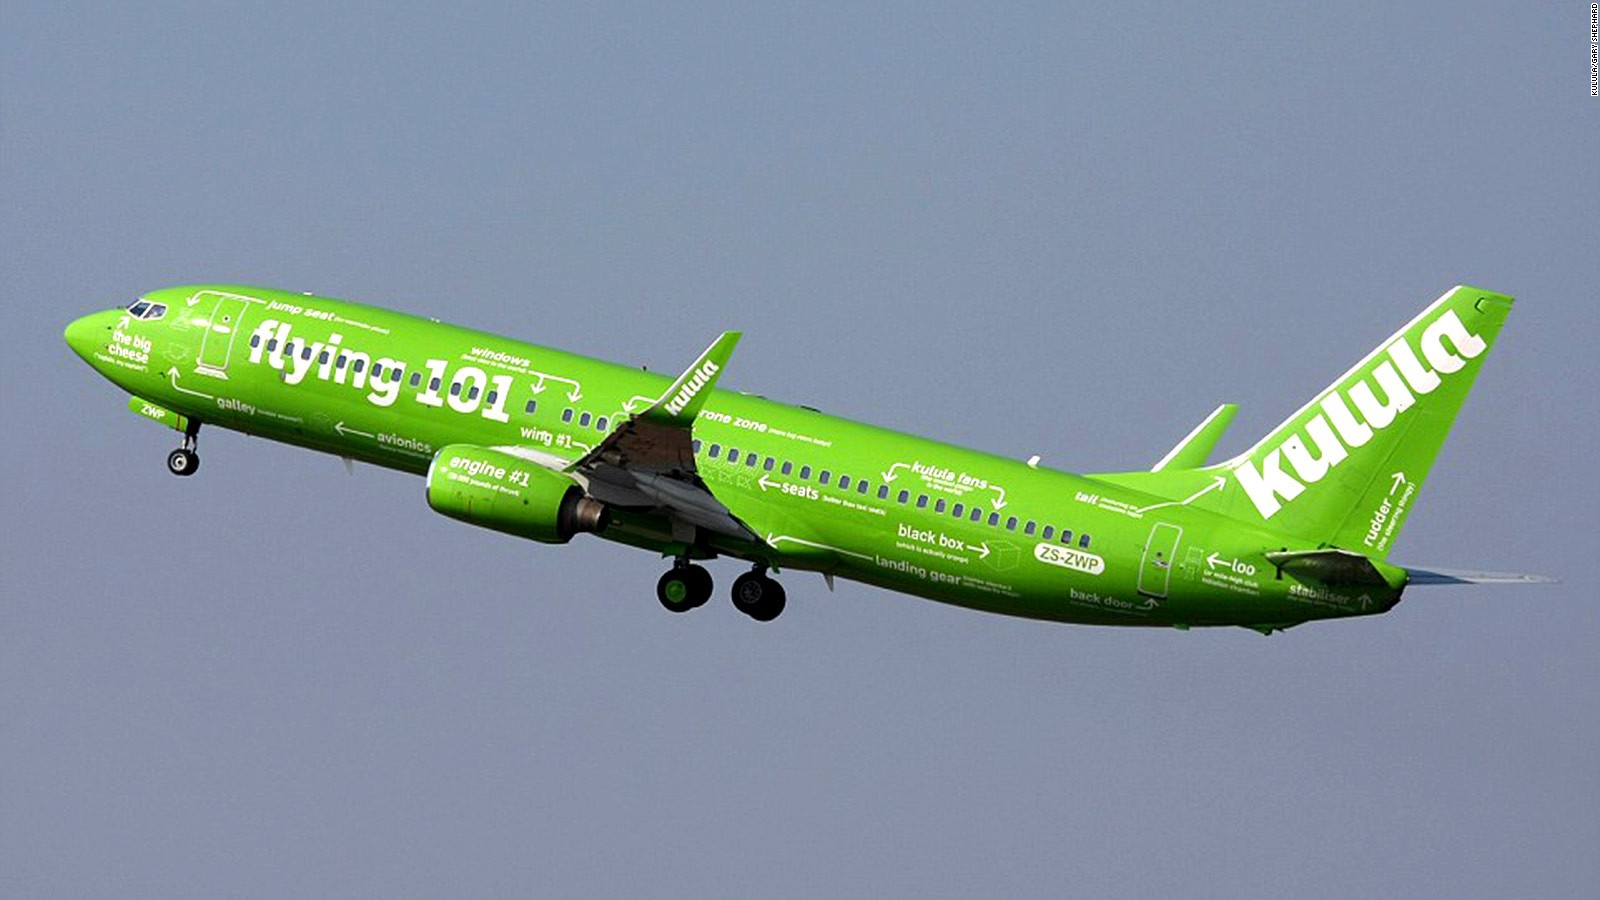 170308141228-aircraft-livery-kulula-flying-101-full-169.jpg